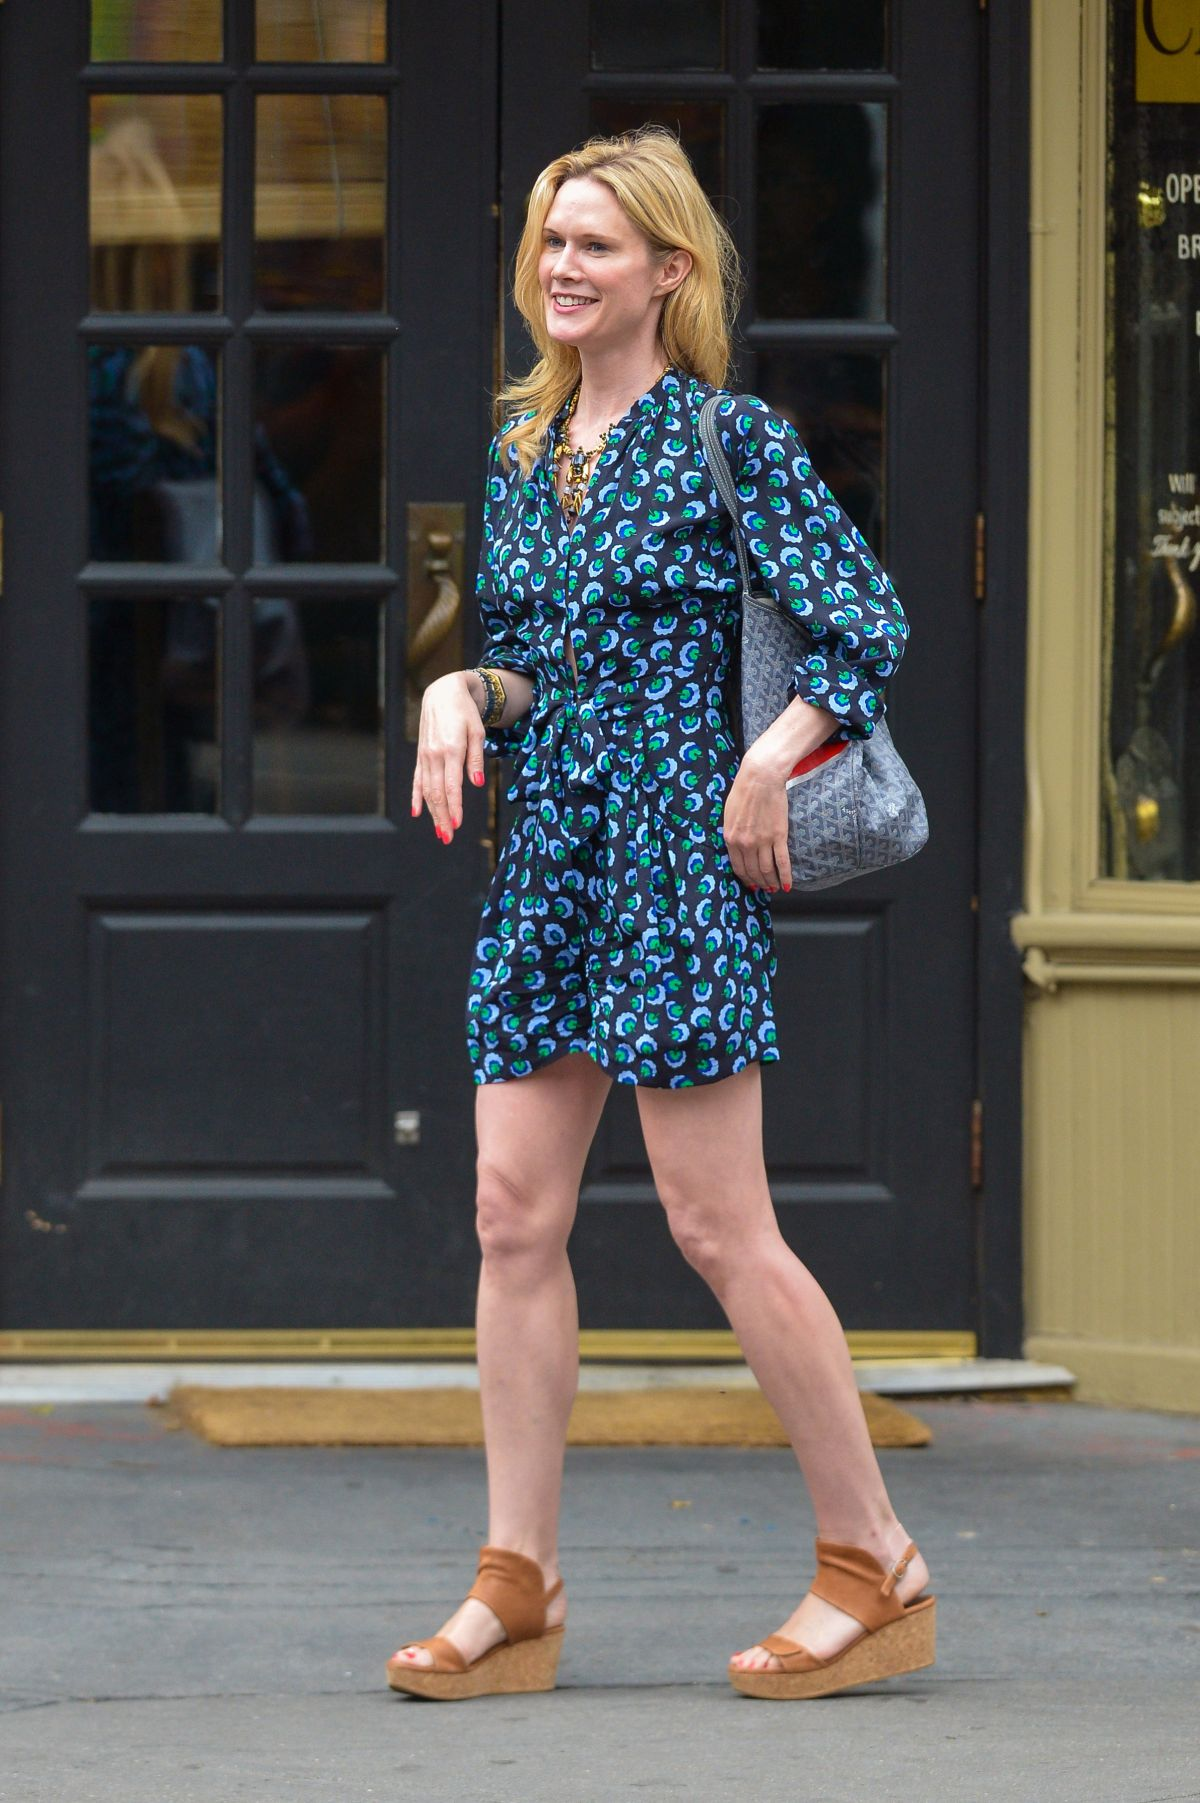 Beverly Sanders,Lameka Fox USA 3 2016?resent Erotic pics & movies Jane Anderson,Sophie Nelisse